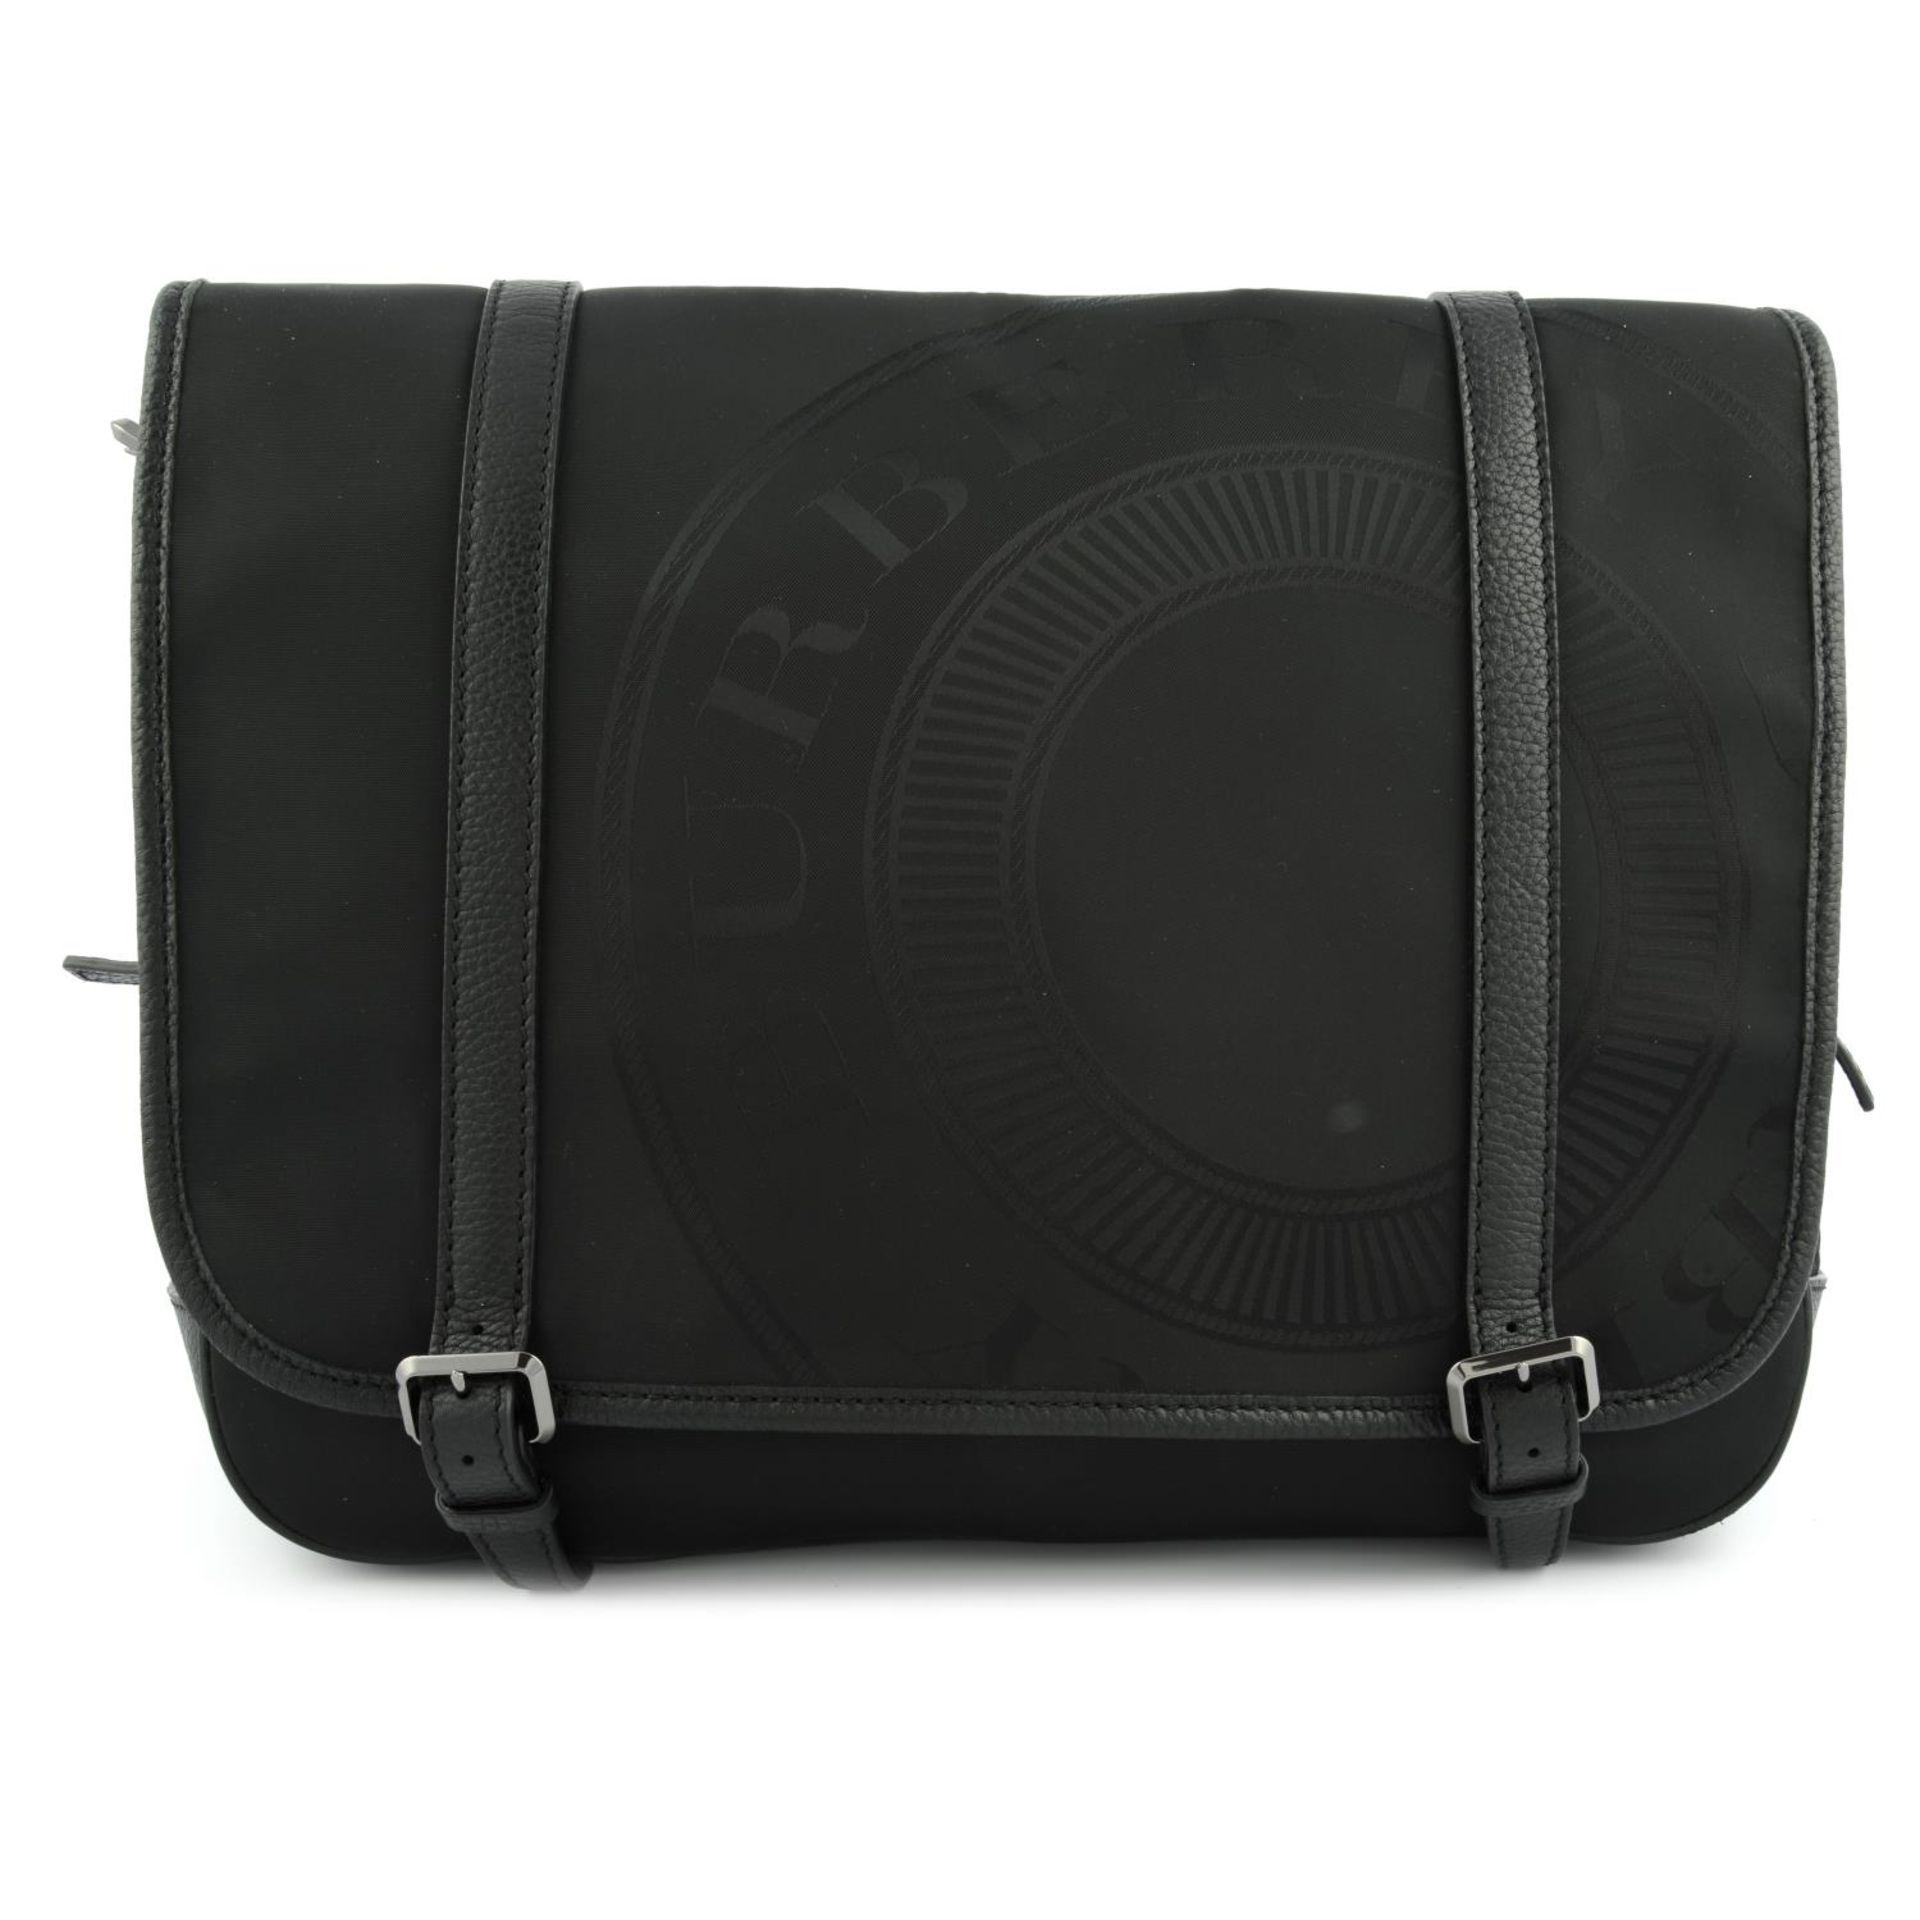 BURBERRY - a nylon messenger satchel.